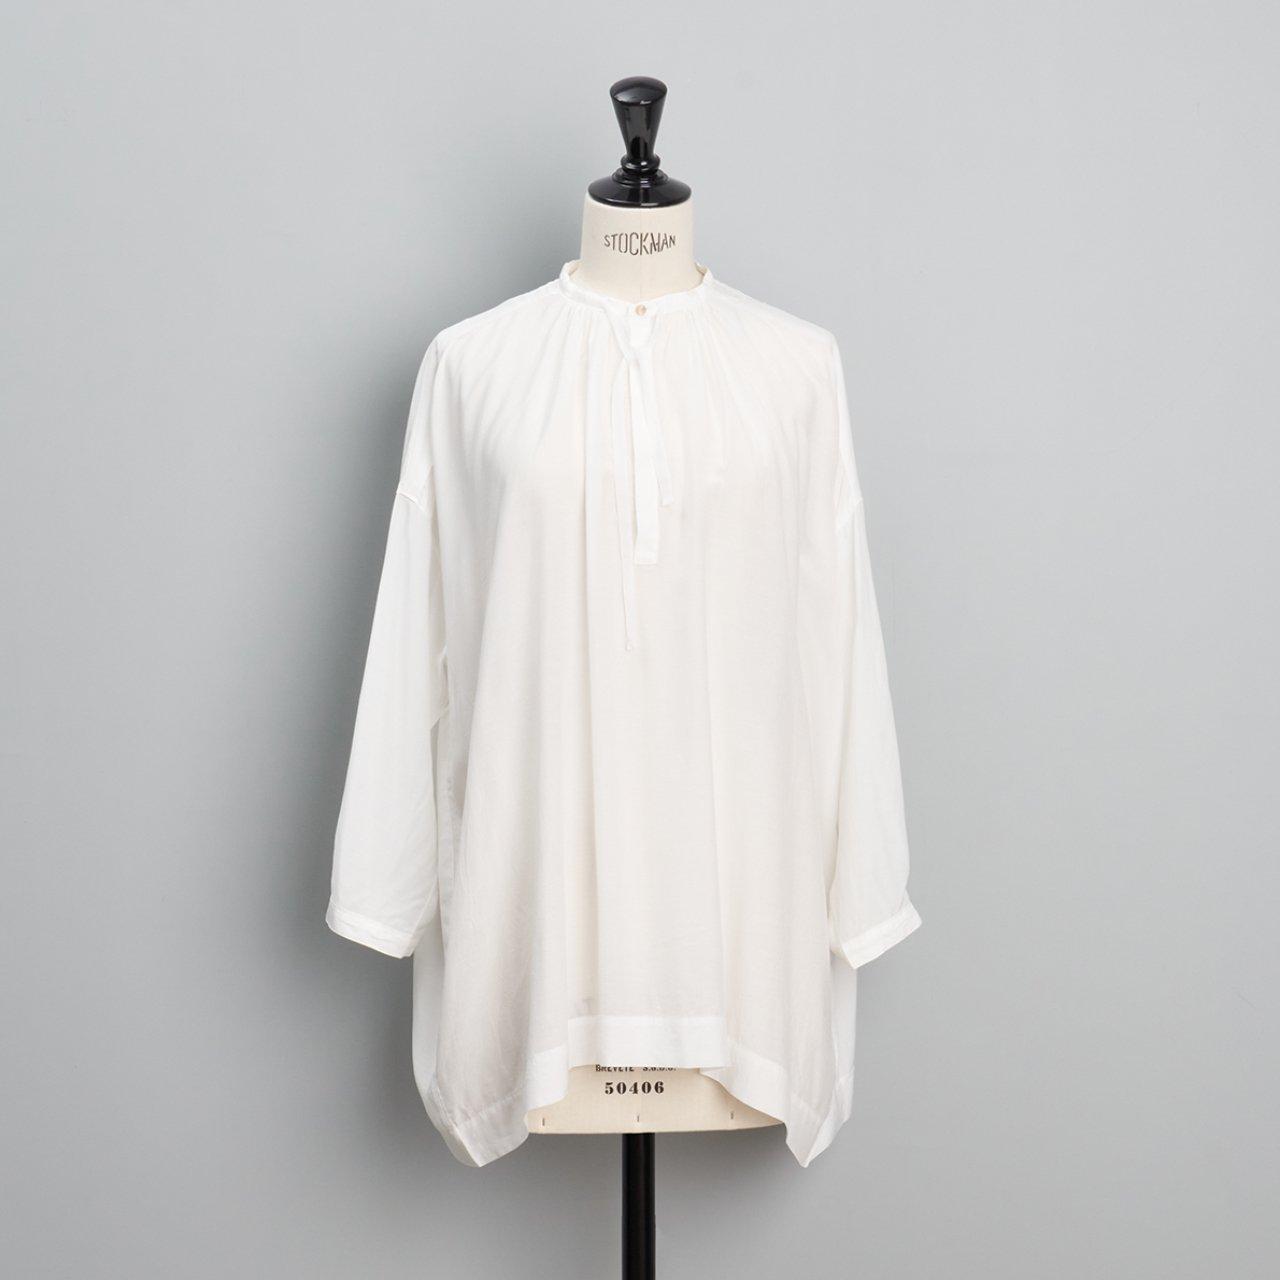 suzuki takayuki<BR>slip-on blouse<BR>nude